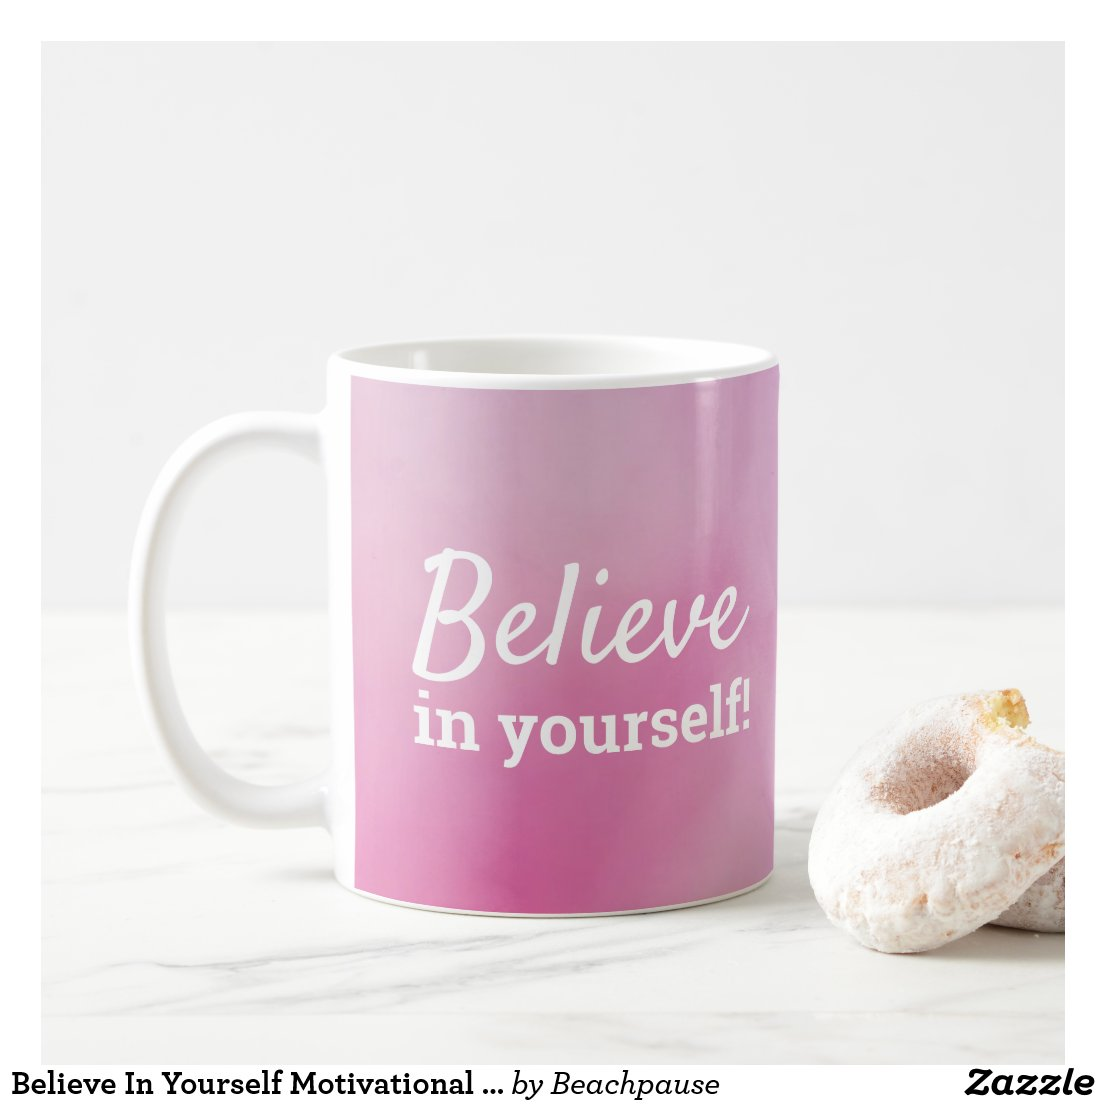 20% off storewide ends 1-18-21 11:59 PM PST CODE ZWEEKENDSHOP - #mugs #coffeelover #coffeelovers #believeinyourself #believe #MotivationalQuotes #motivationalquote #FridayMotivation #uniquegifts #designinspiration #beachpausedesigns #zazzlemade #zazzle